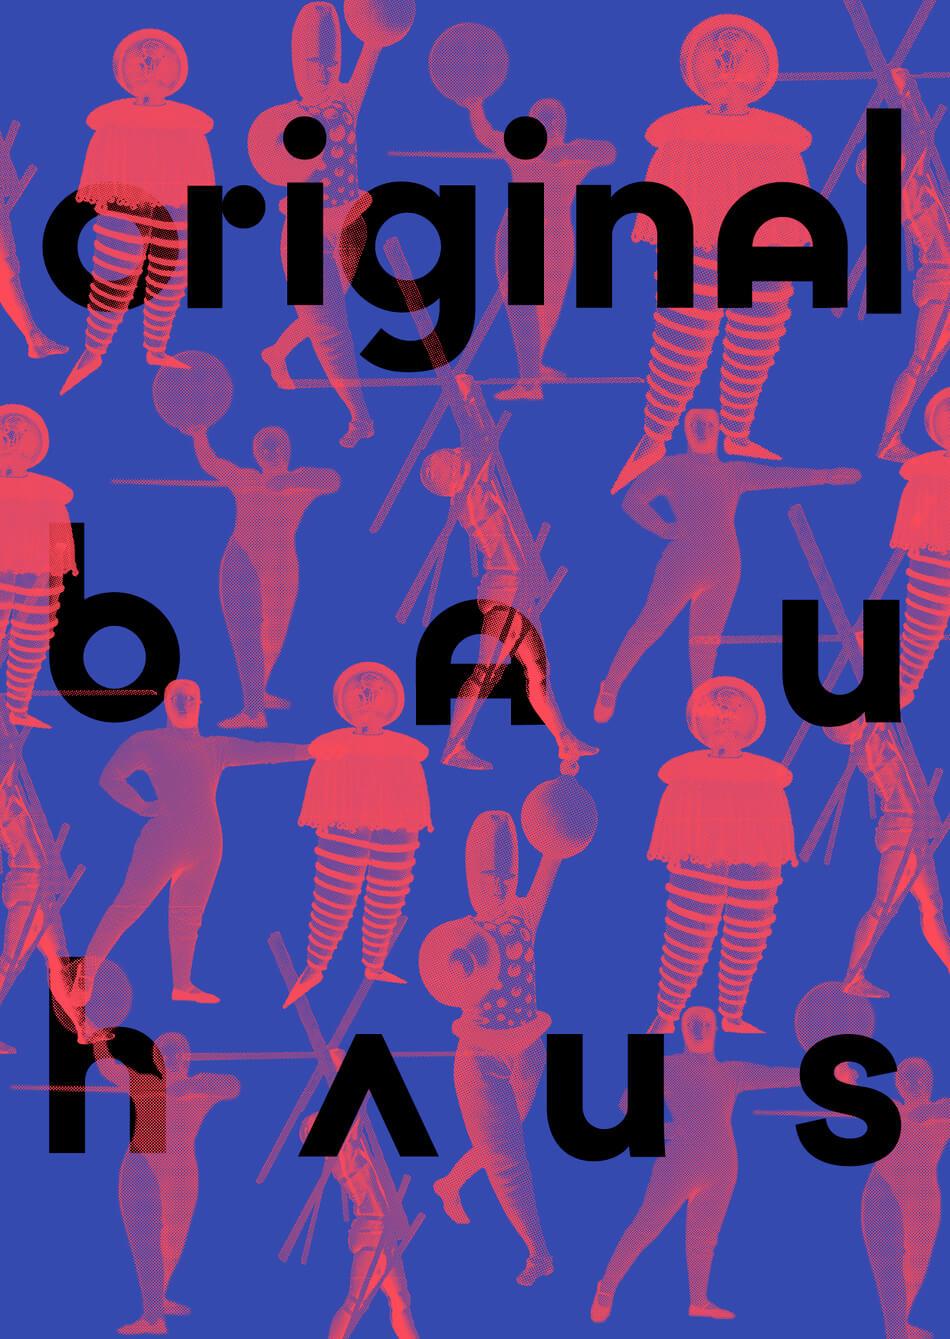 Original Bauhaus